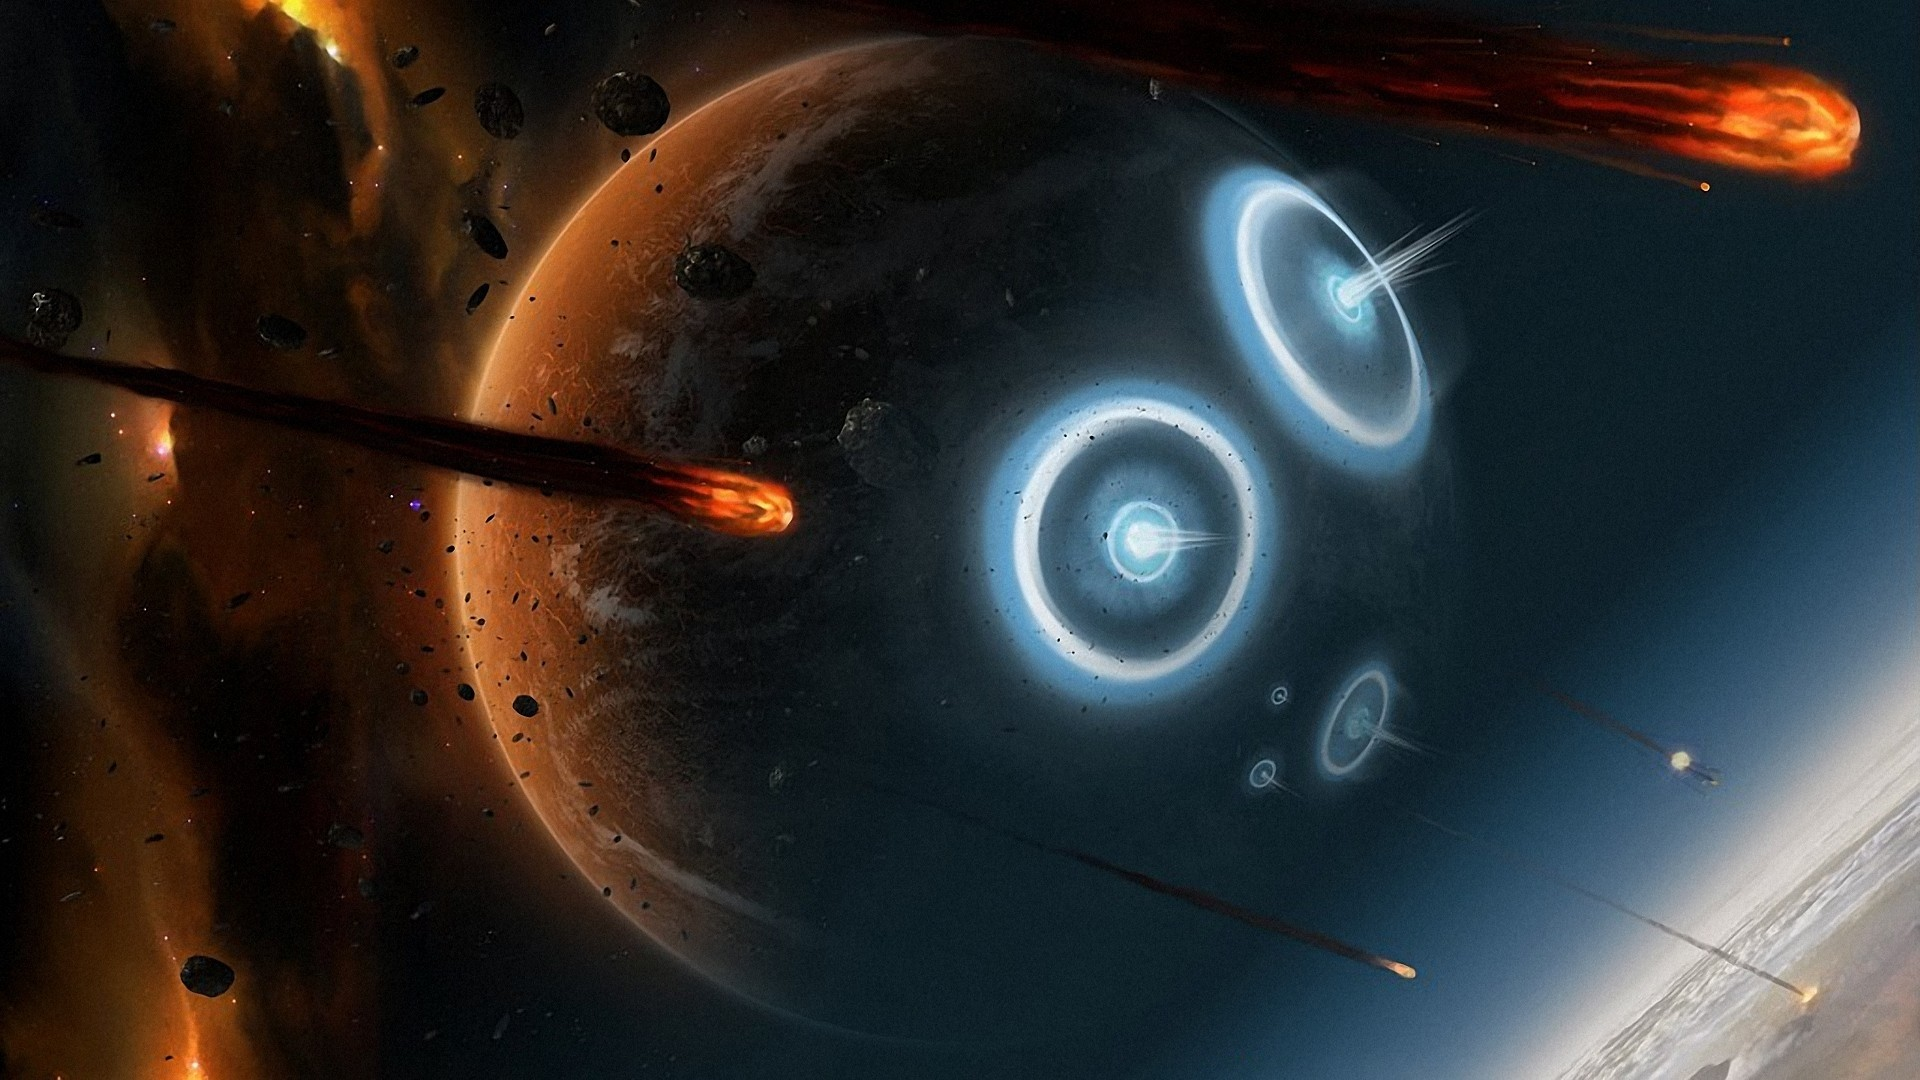 General 1920x1080 digital art universe space planet stars meteors burning explosion fire